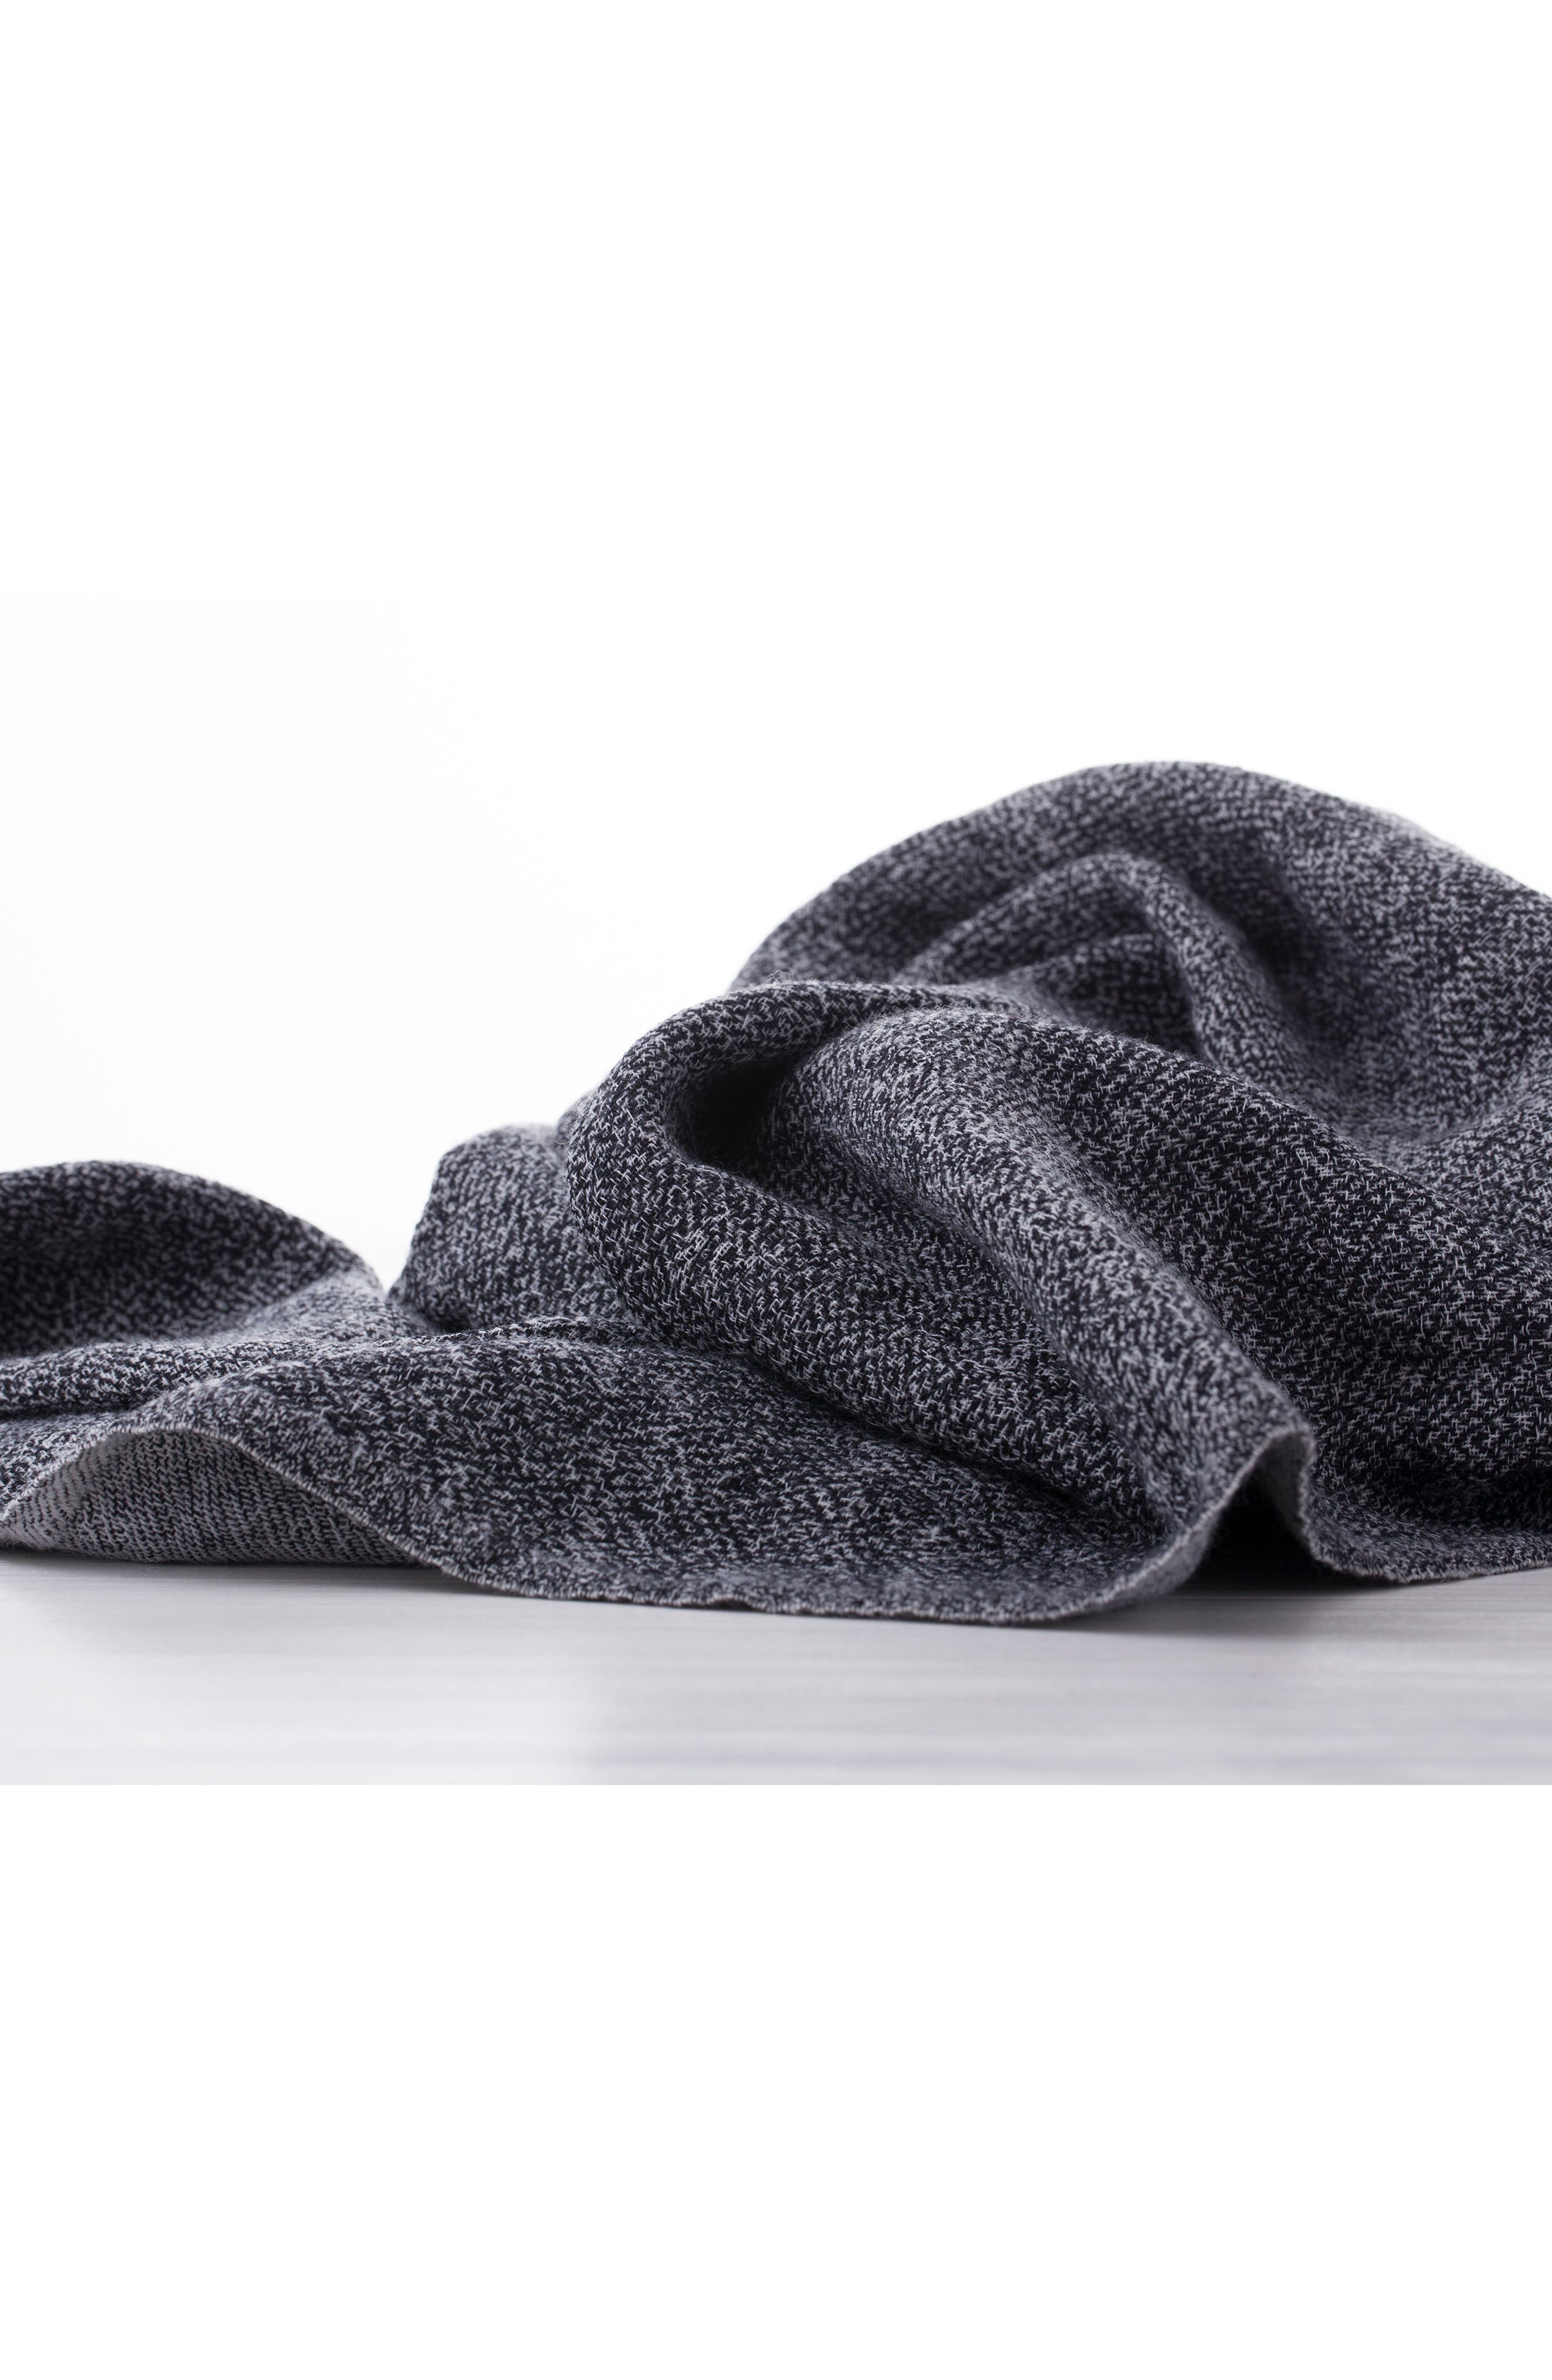 Blurred Herringbone Merino Wool Throw,                             Alternate thumbnail 4, color,                             BLURRED HERRINGBONE GREY